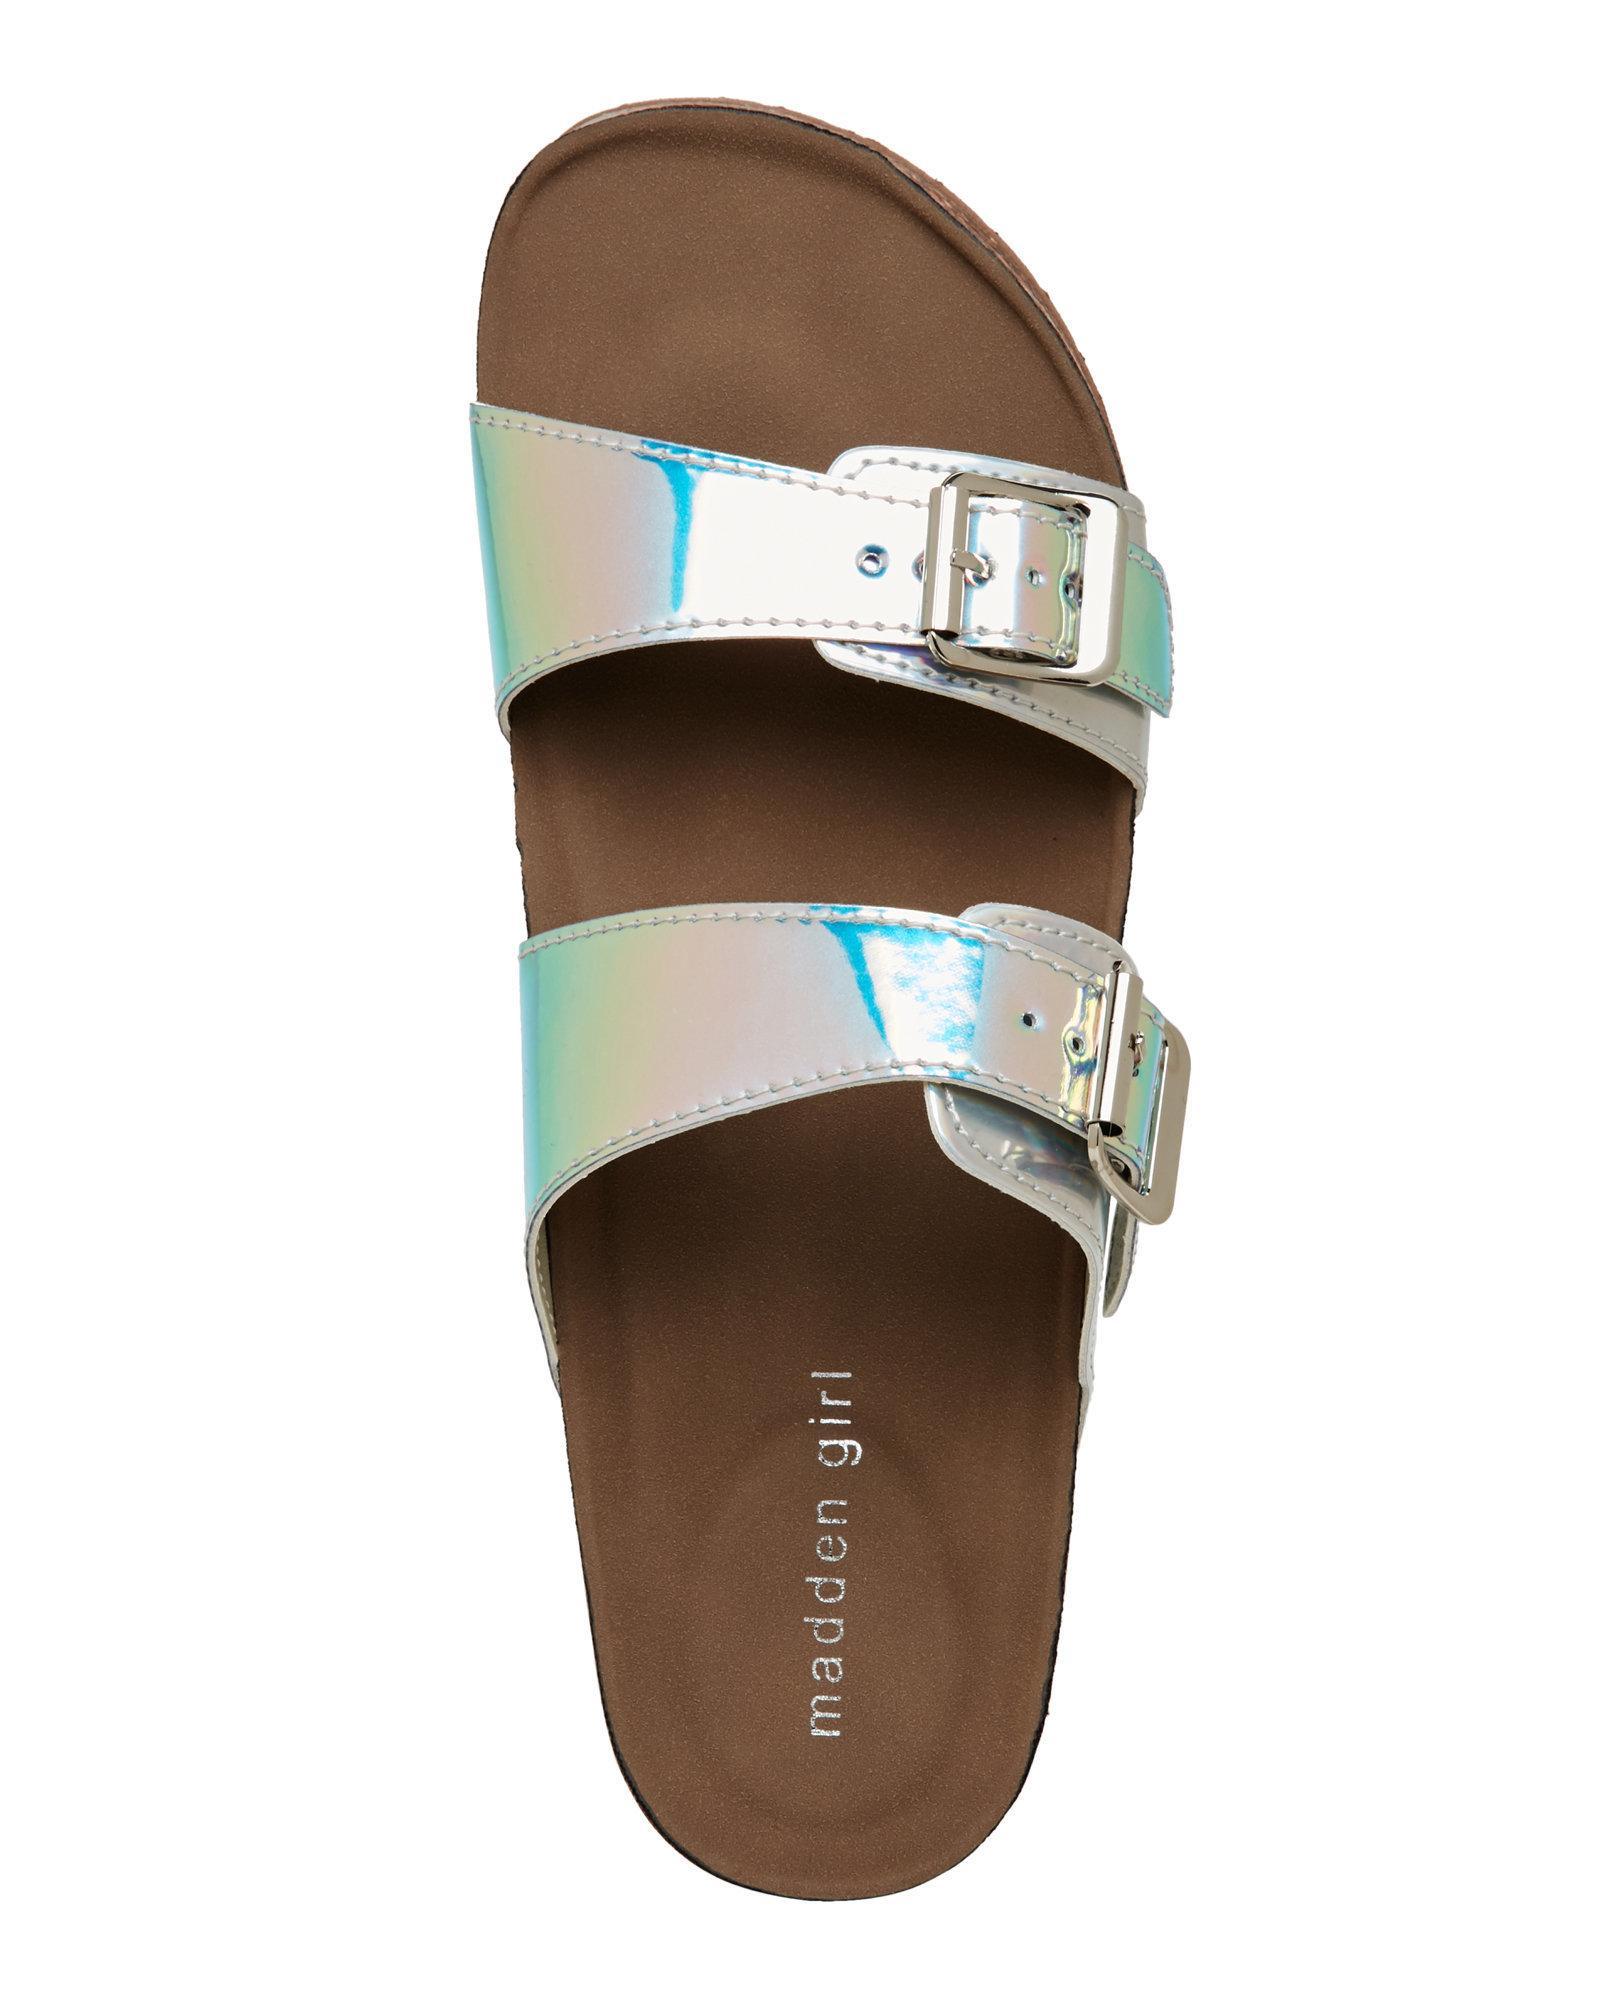 50b4688183cdb1 Lyst - Madden Girl Iridescent Brando Footbed Sandals